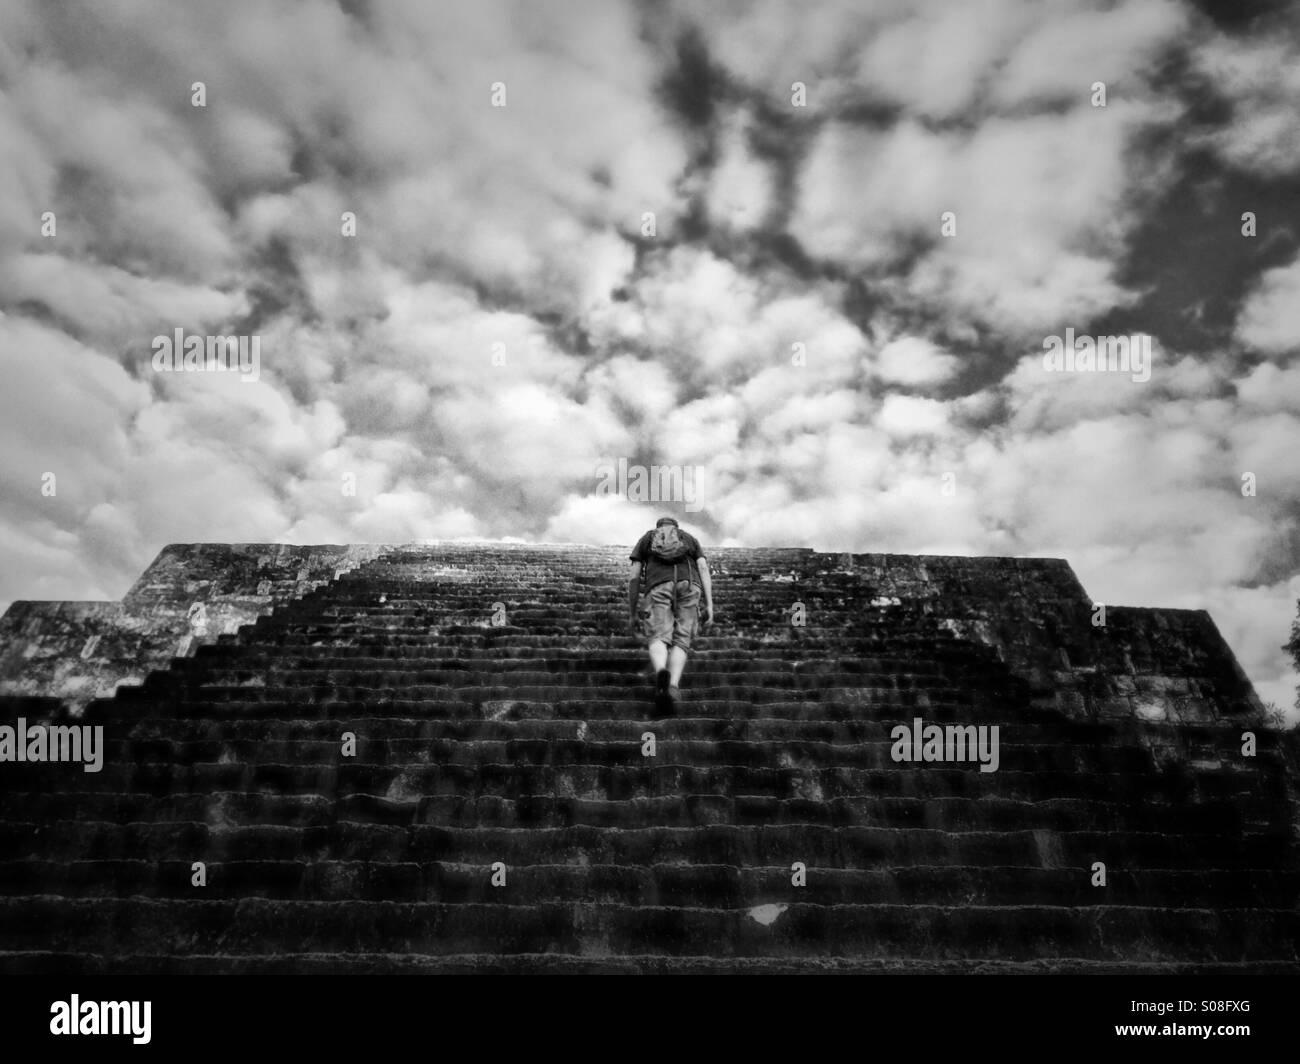 Man climbing pyramid at Tikal, Guatemala - Stock Image